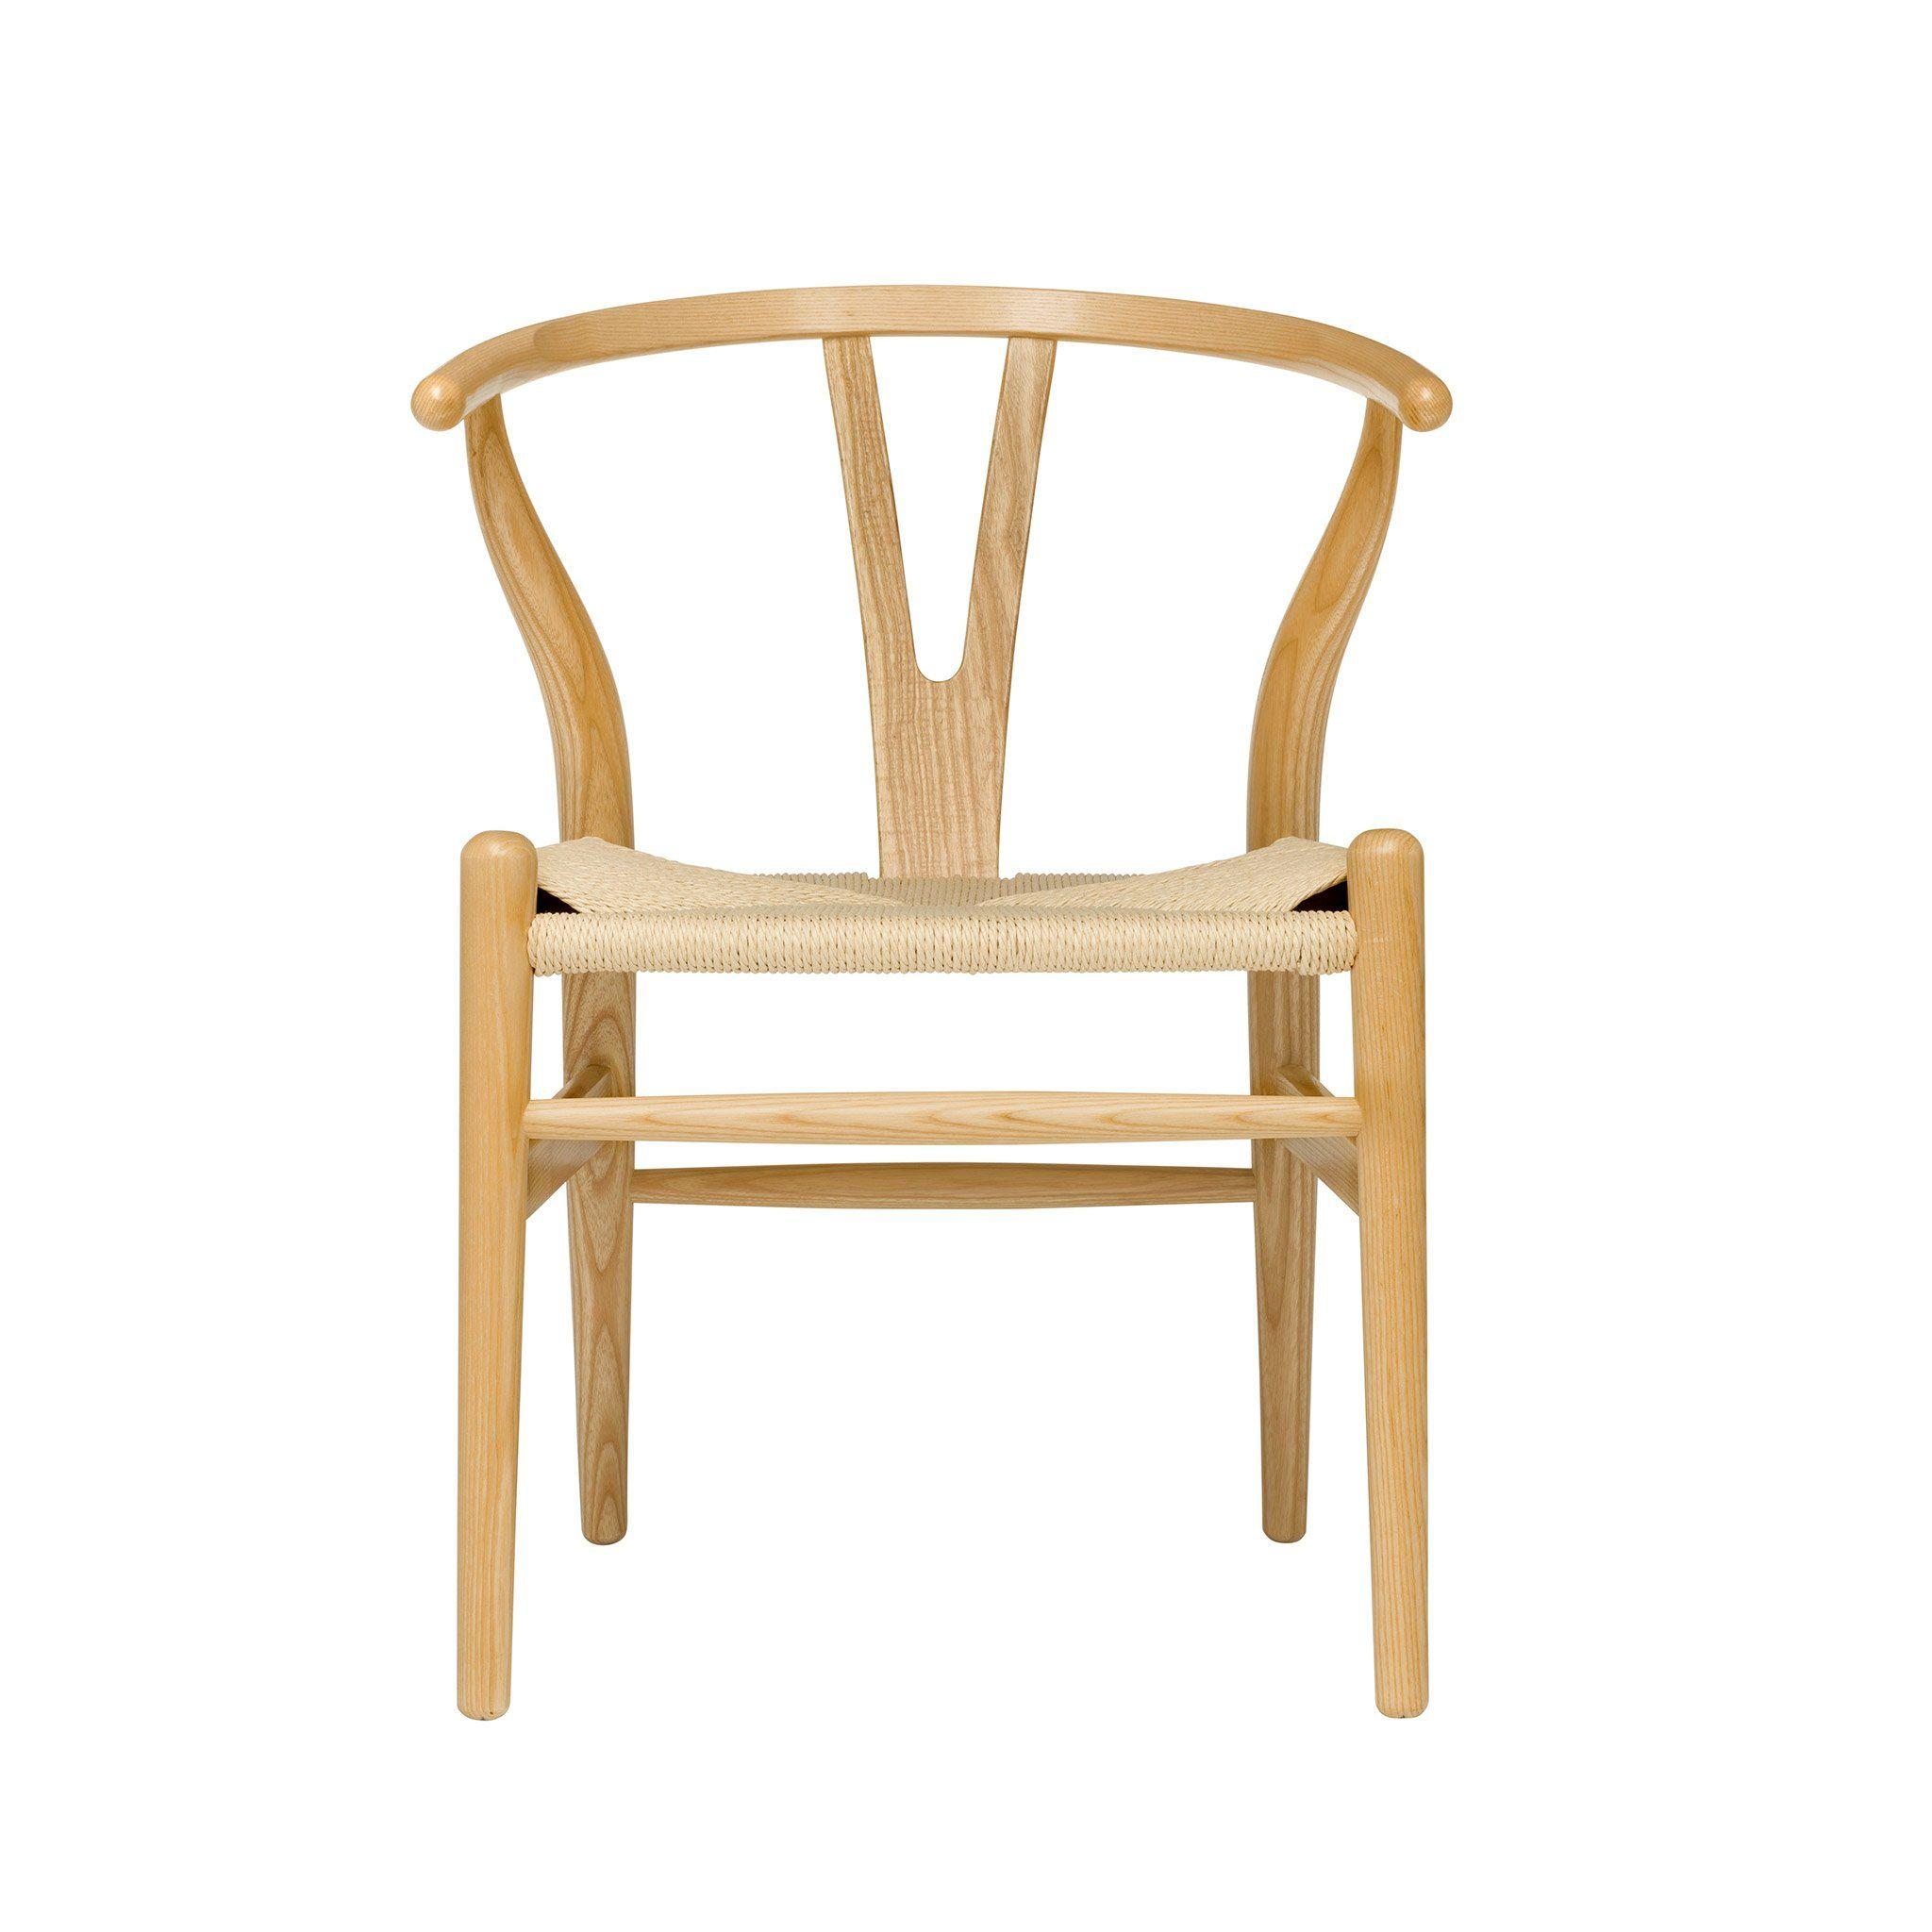 Wishbone Chair (Ash/Woven Cord) Wishbone chair, Chair